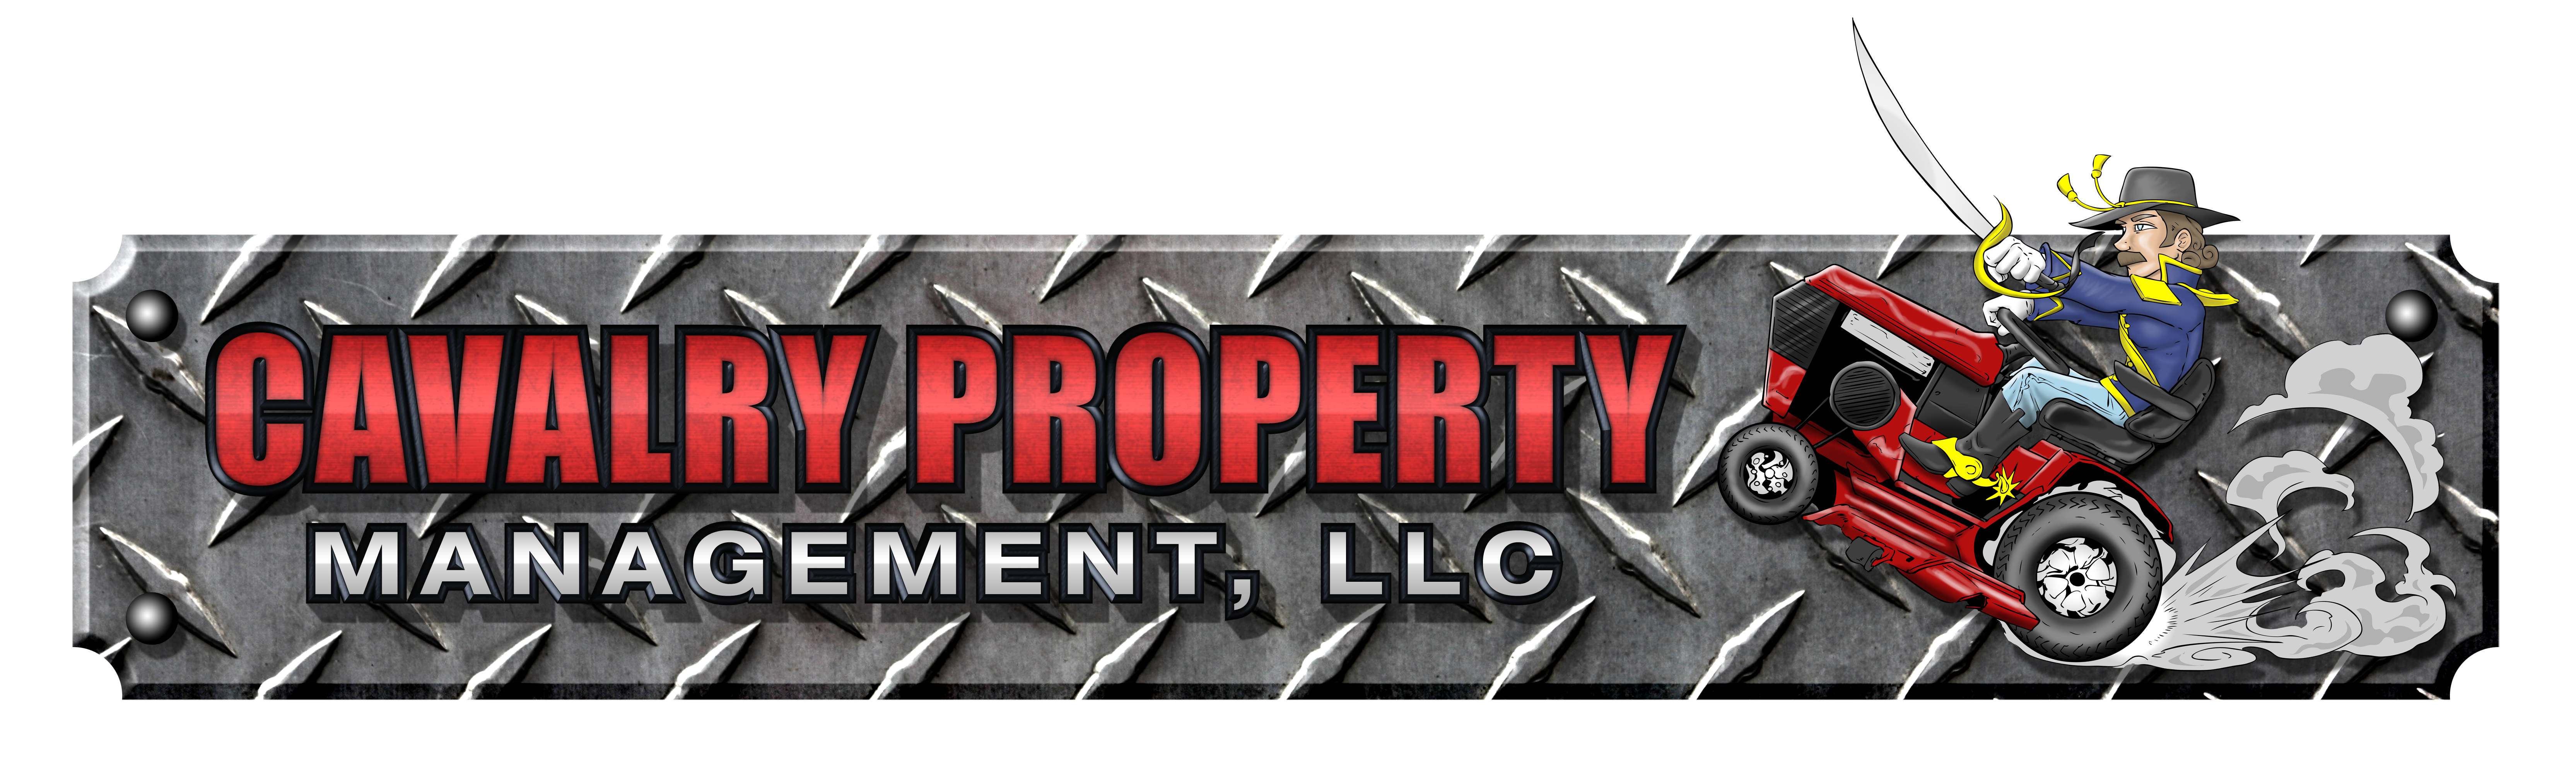 cavalry-property-management-llc_final-logo_full-color